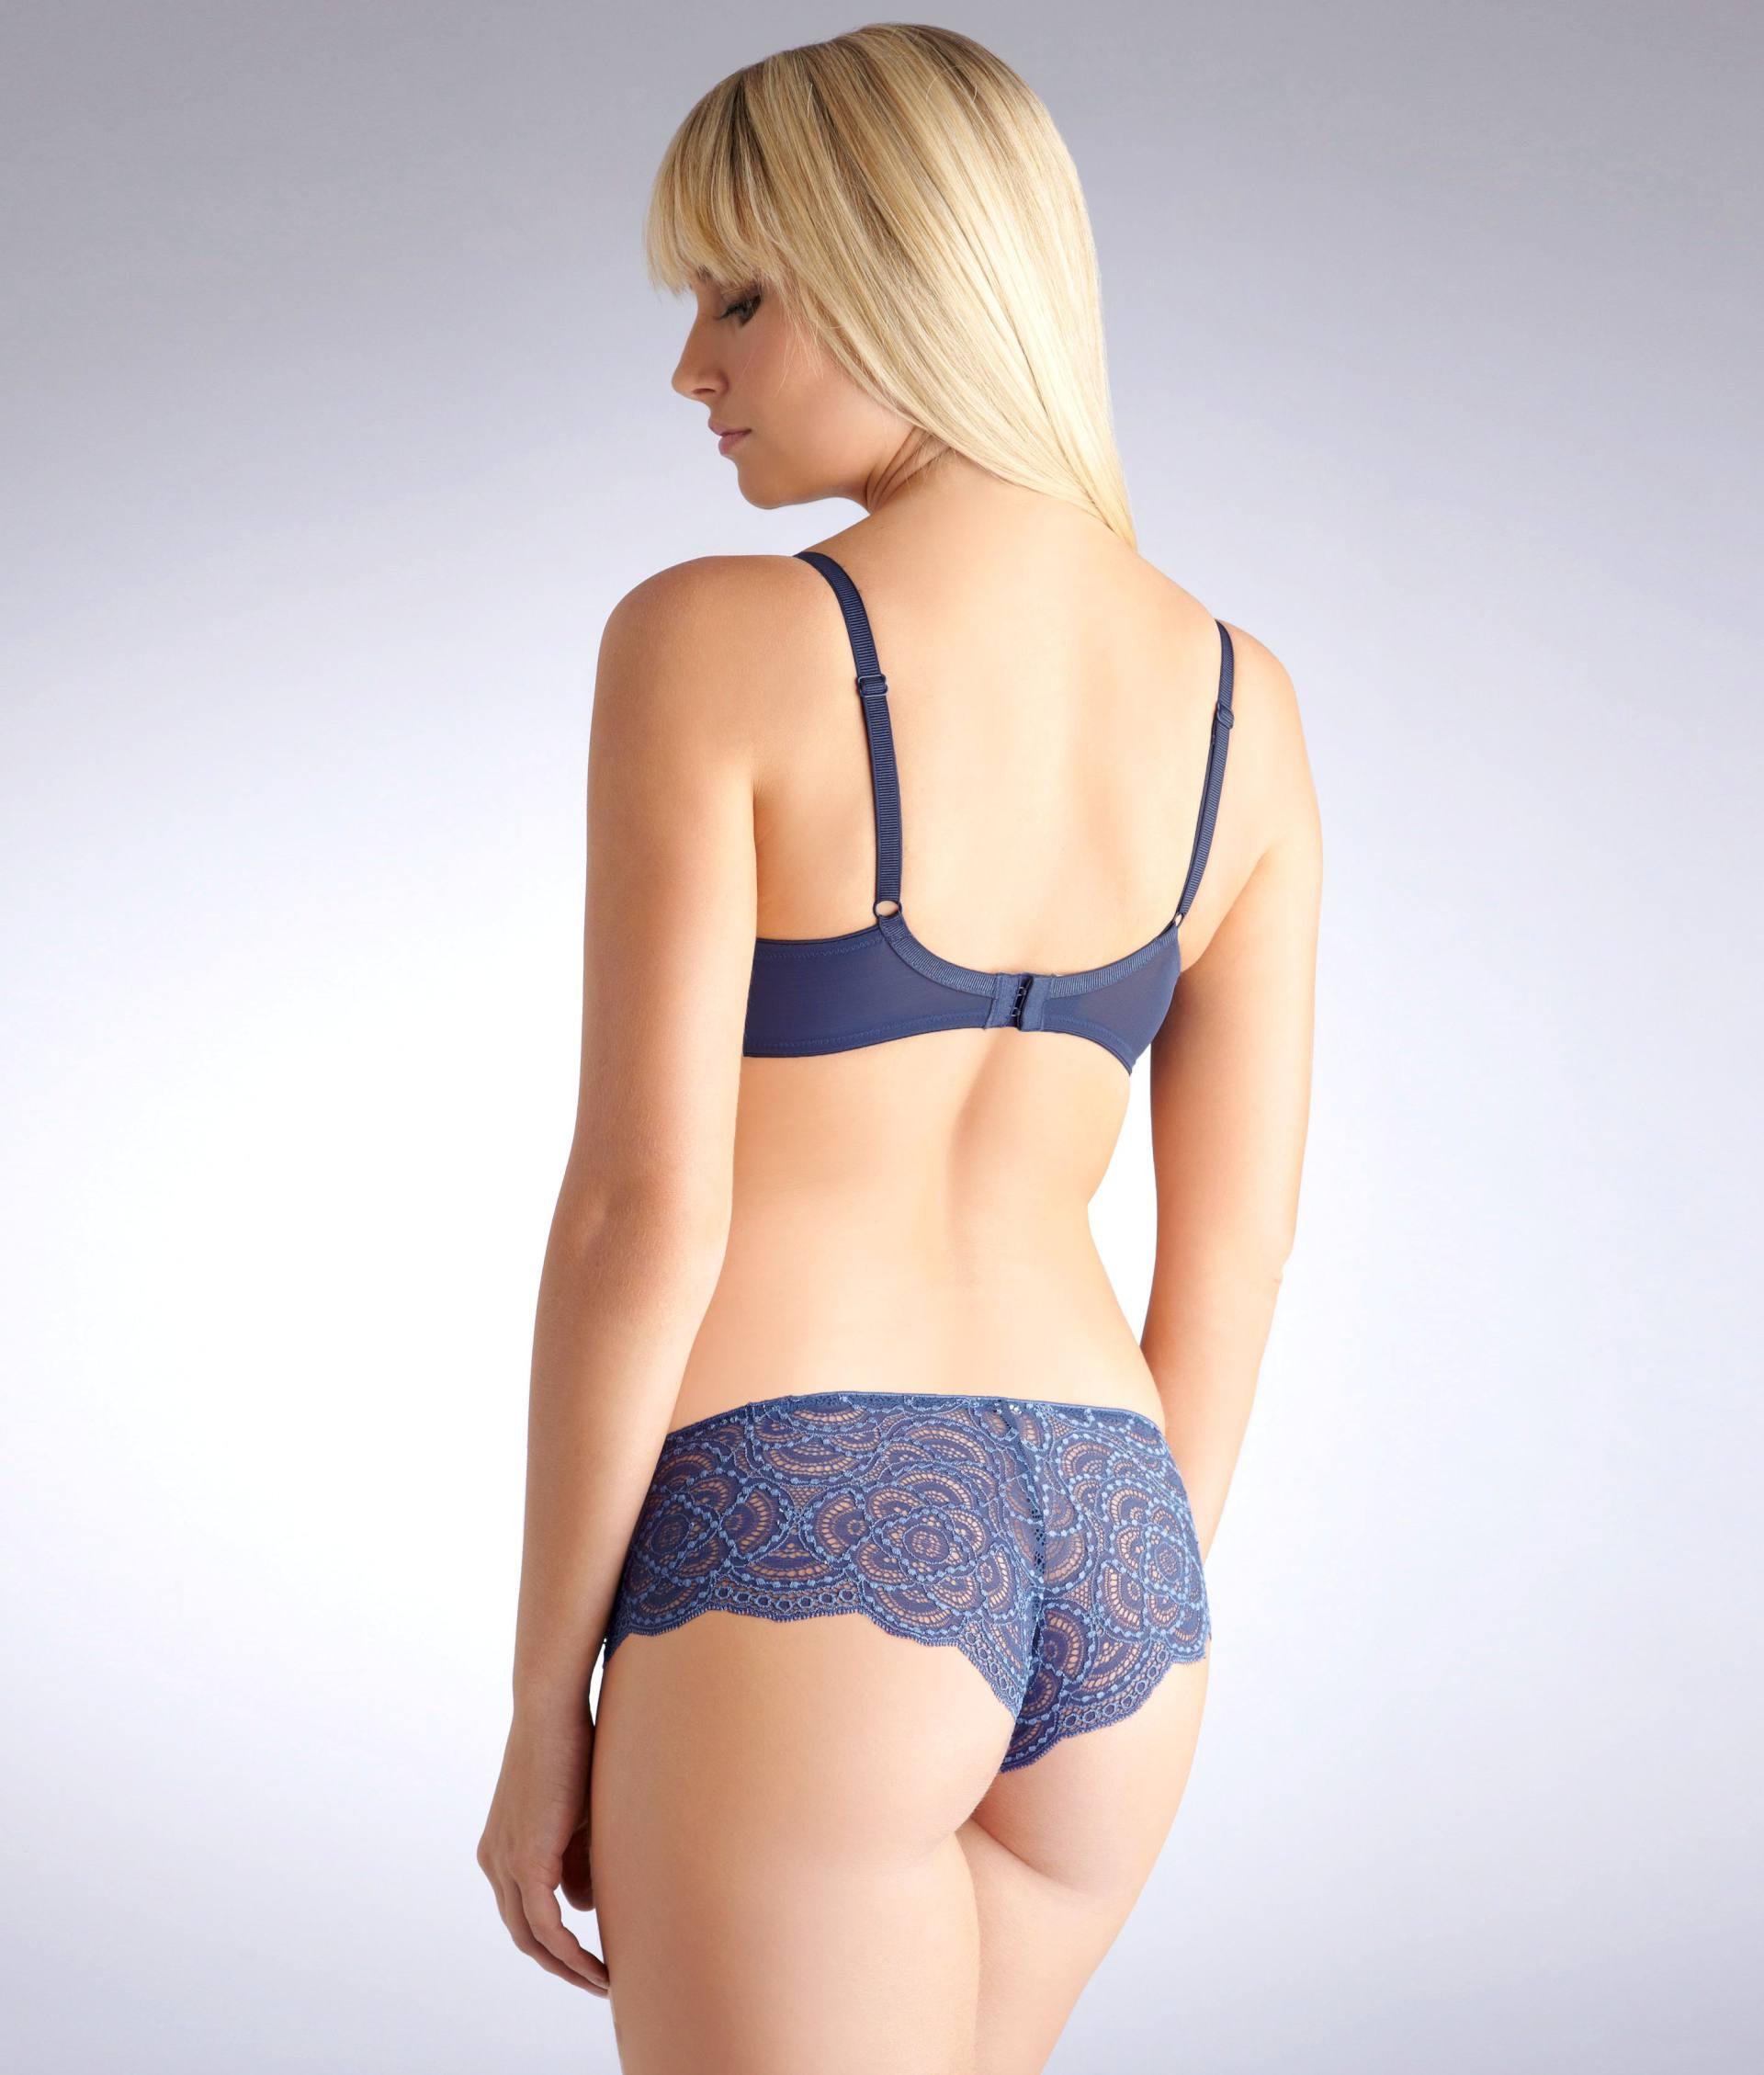 Genevieve Morton Sexy Boobs In Lingerie